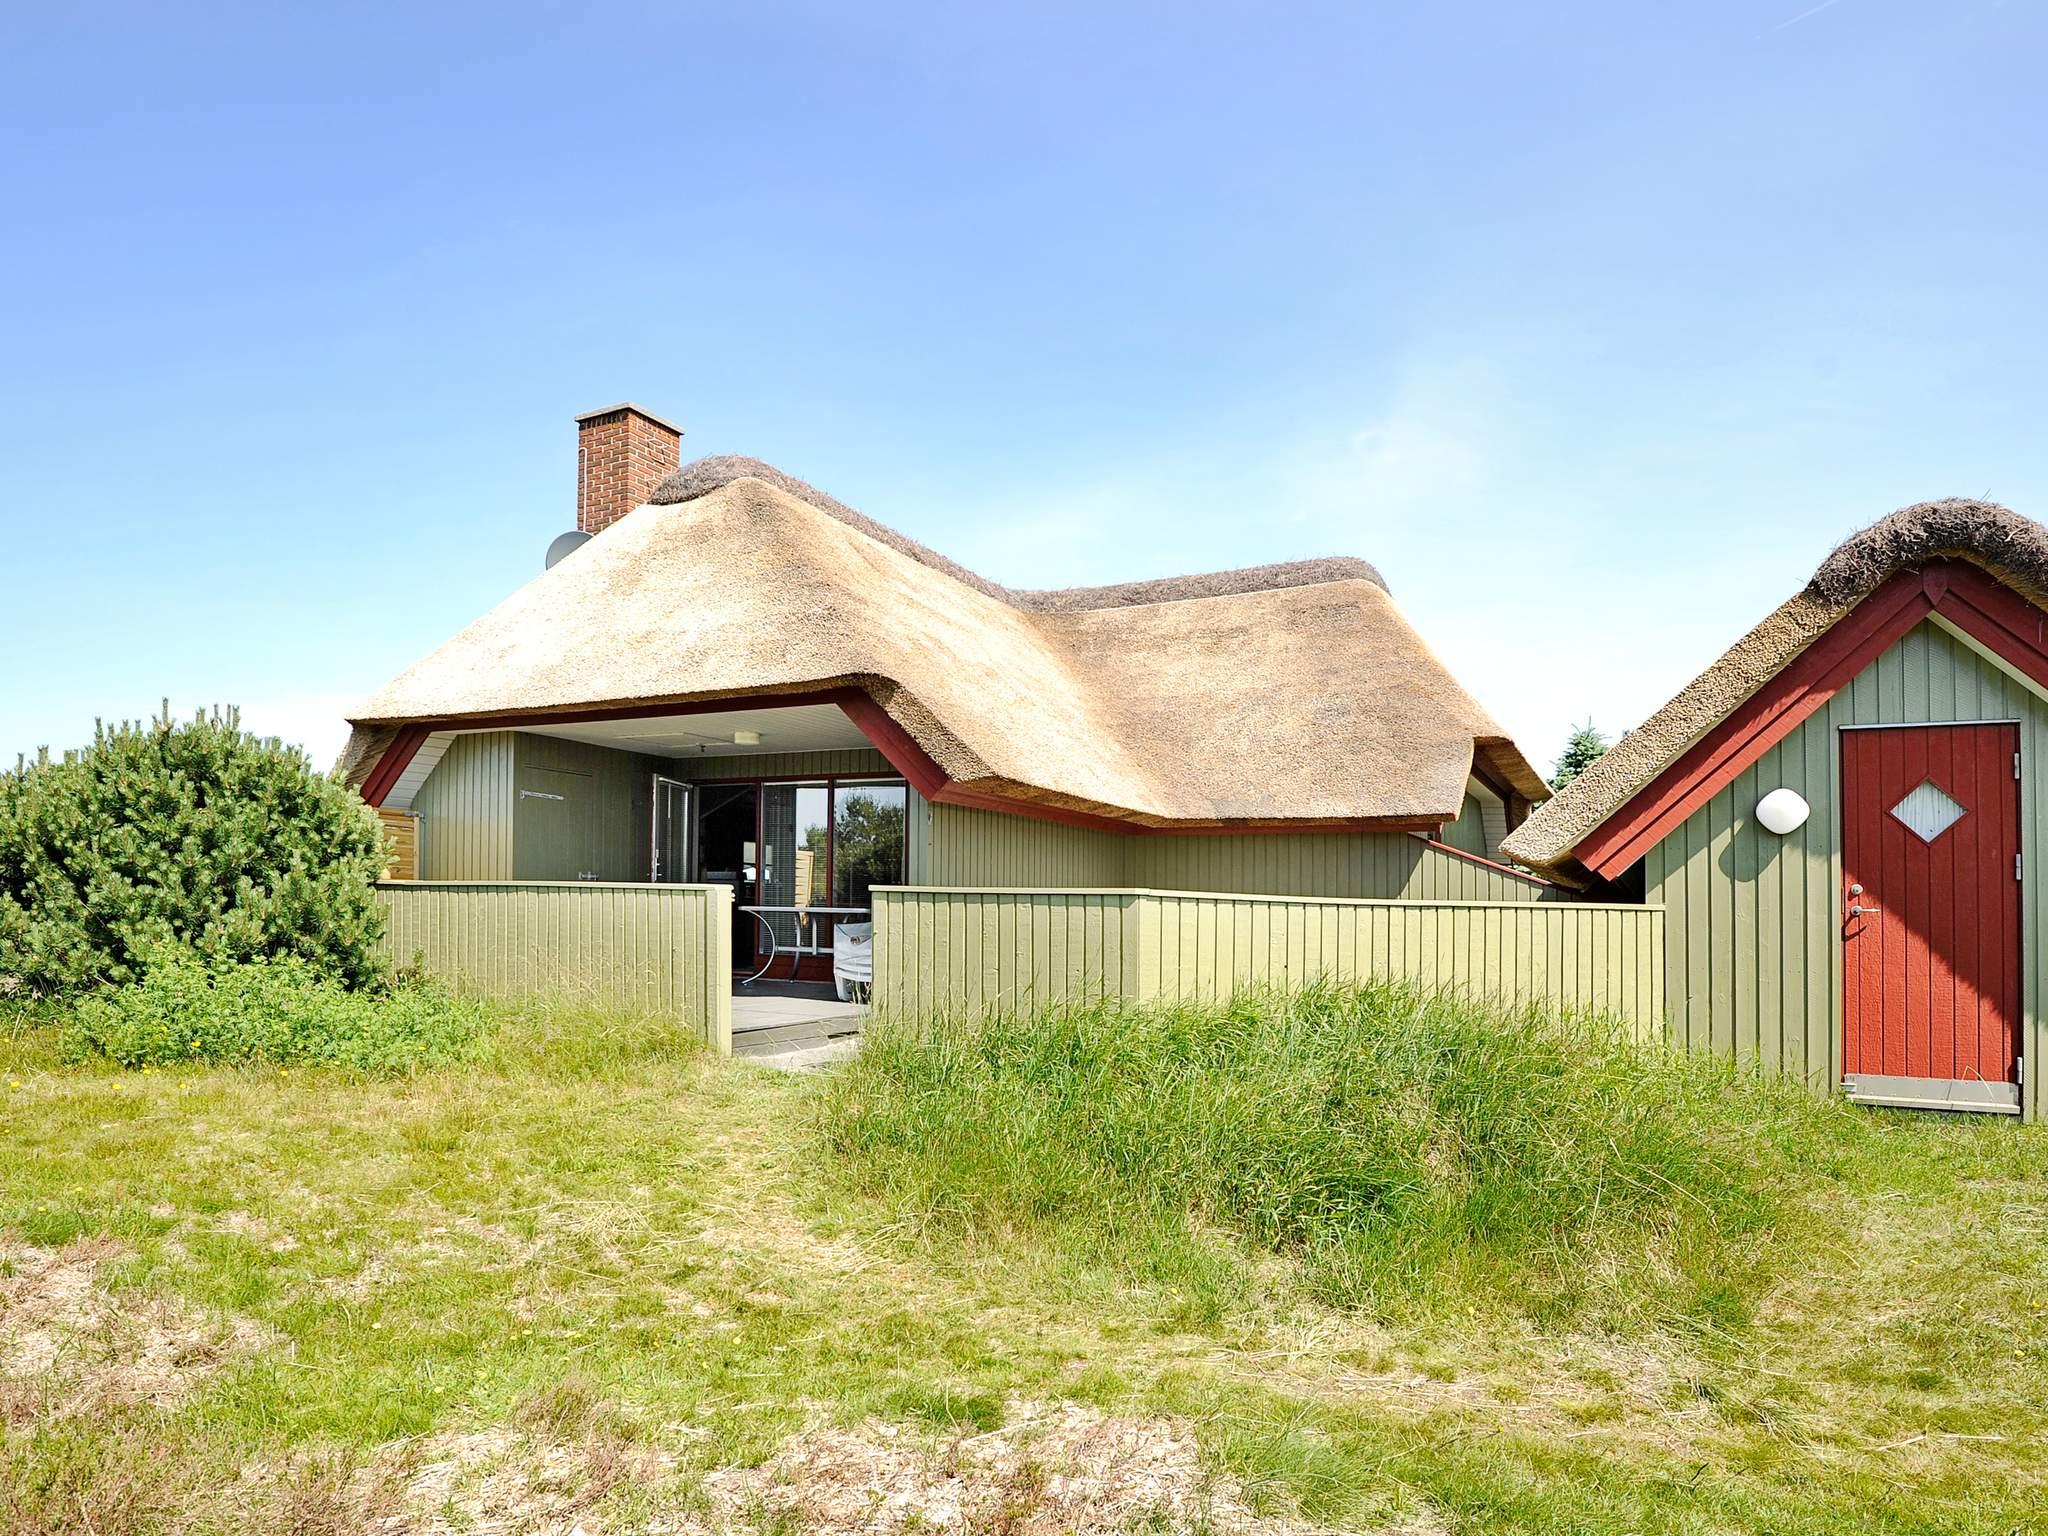 Ferienhaus Blåvand (88476), Blåvand, , Westjütland, Dänemark, Bild 1